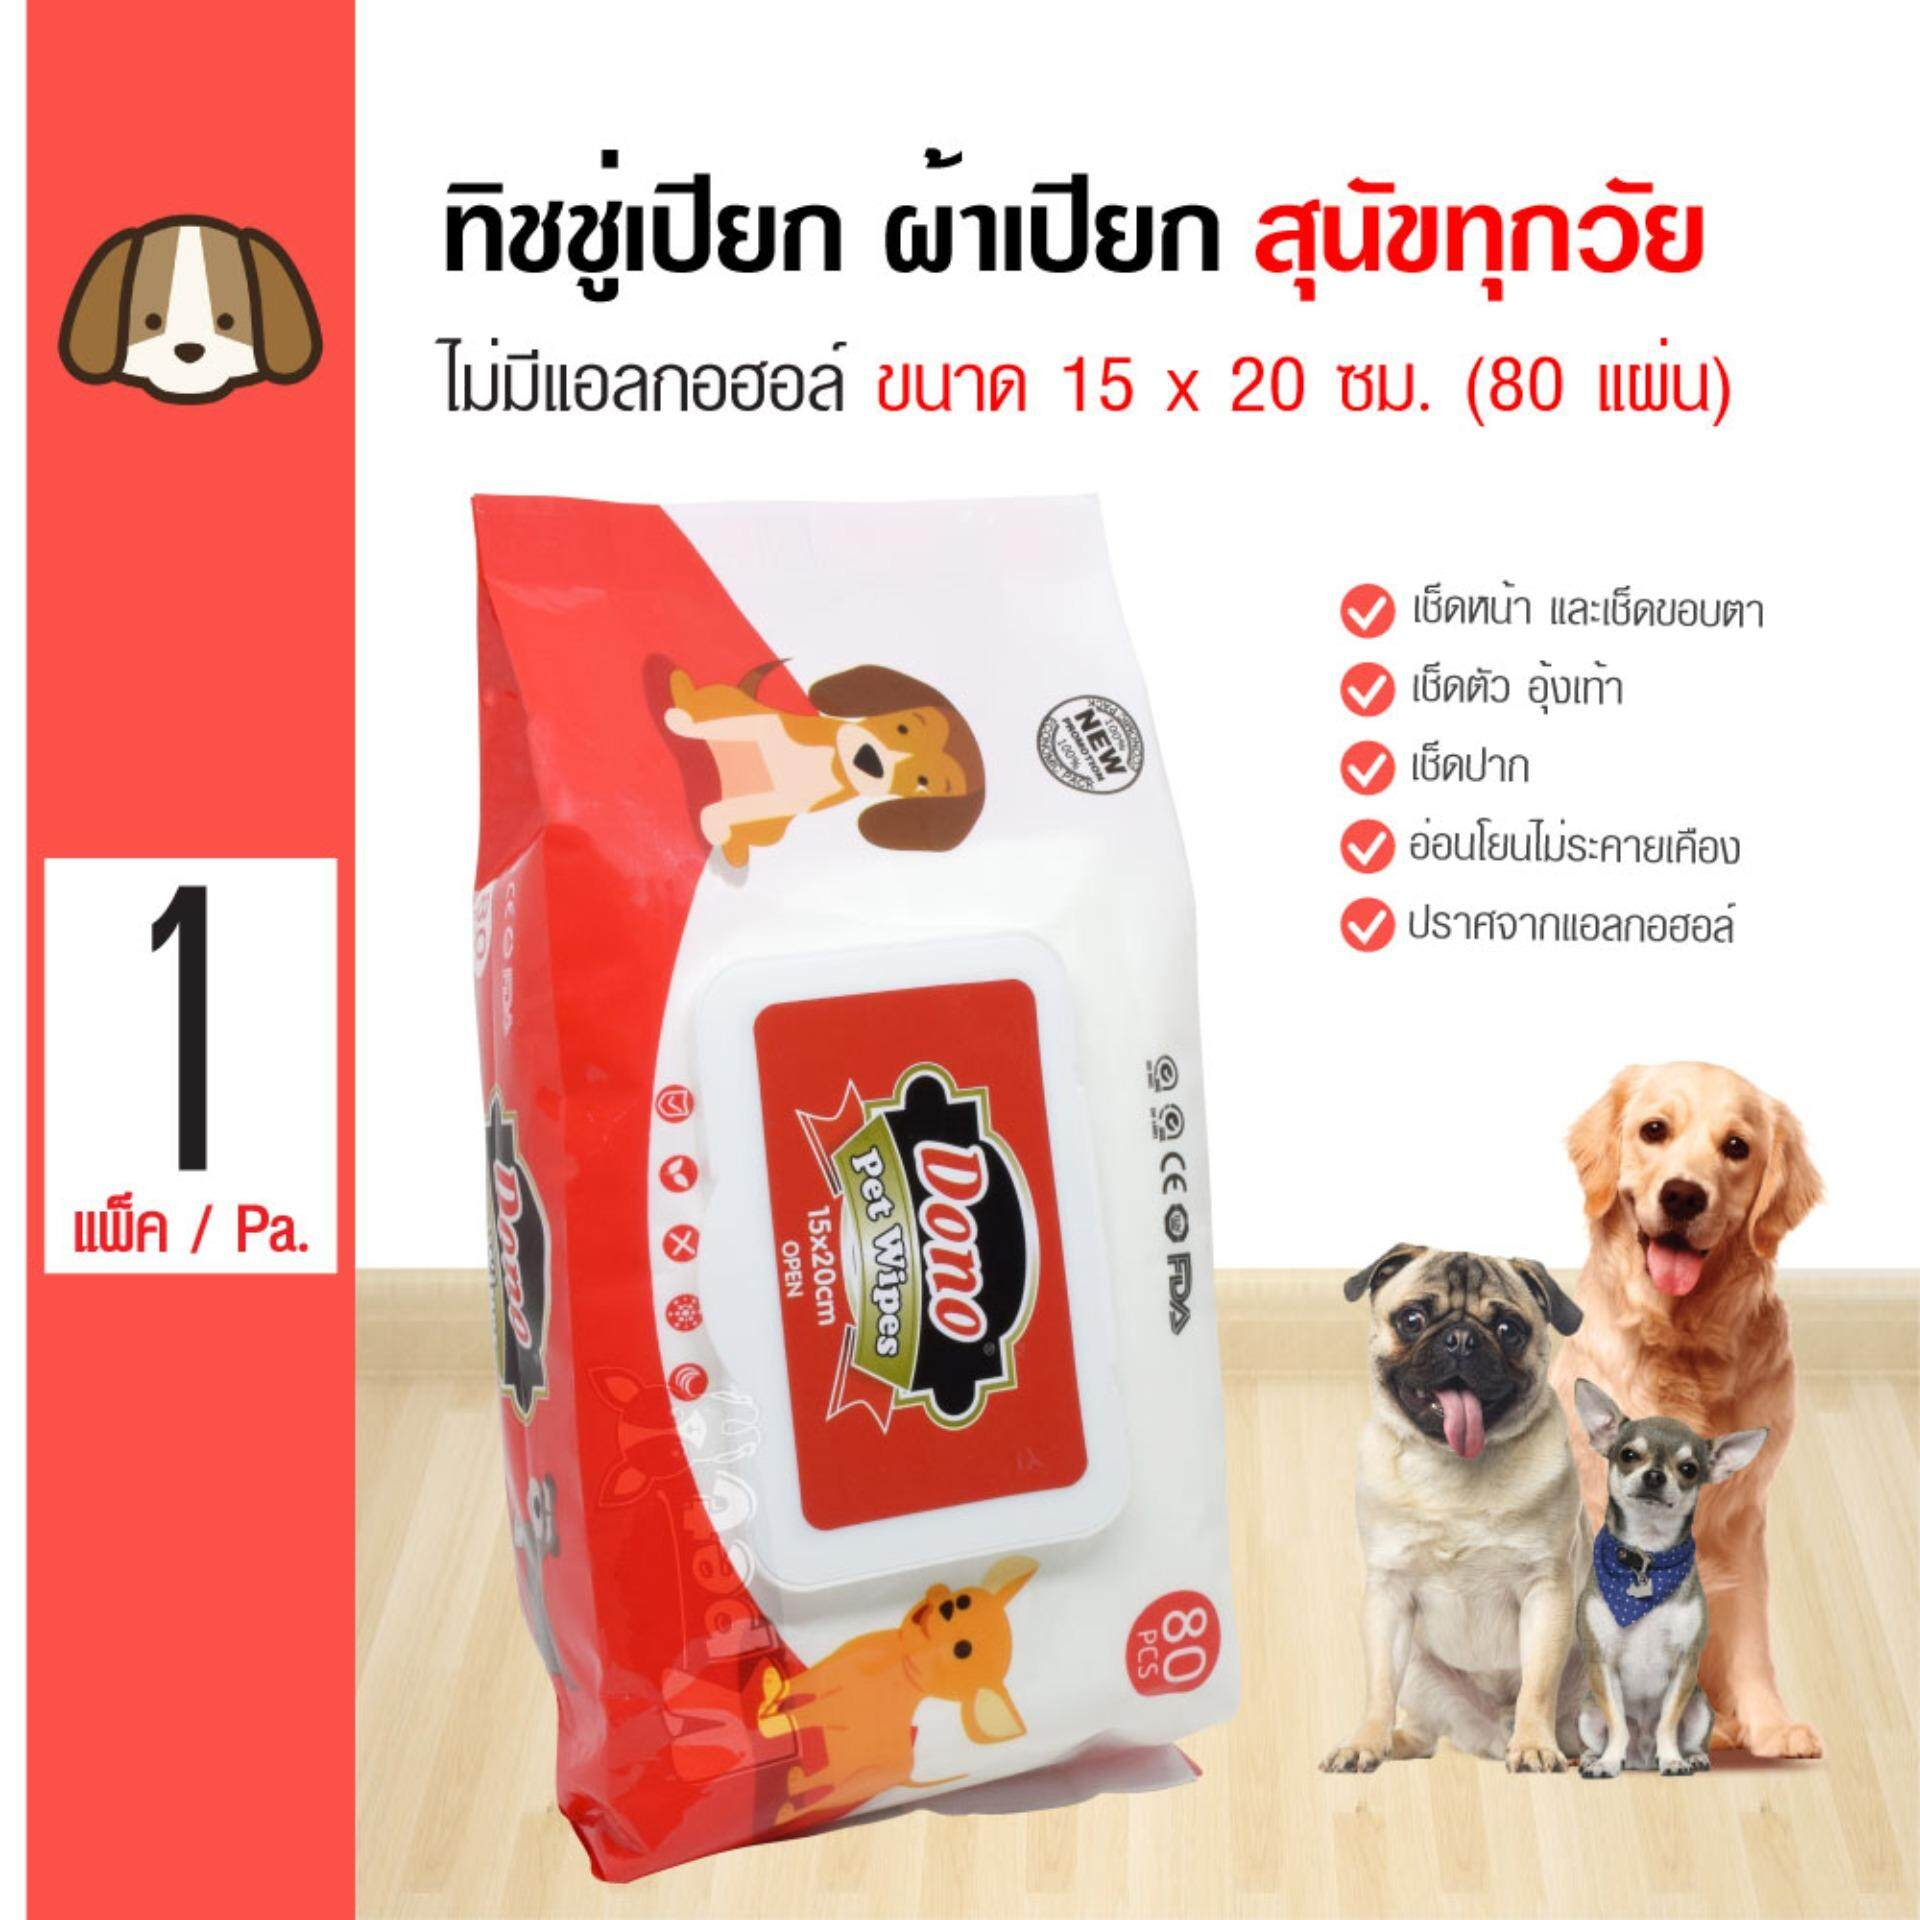 Dono Pet Wipes ผ้าเปียกทำความสะอาด ไม่มีแอลกอฮอล์ ทิชชู่เปียก สำหรับสุนัขทุกวัย ขนาด 15x20 ซม. (80 แผ่น/ แพ็ค) By Kpet.